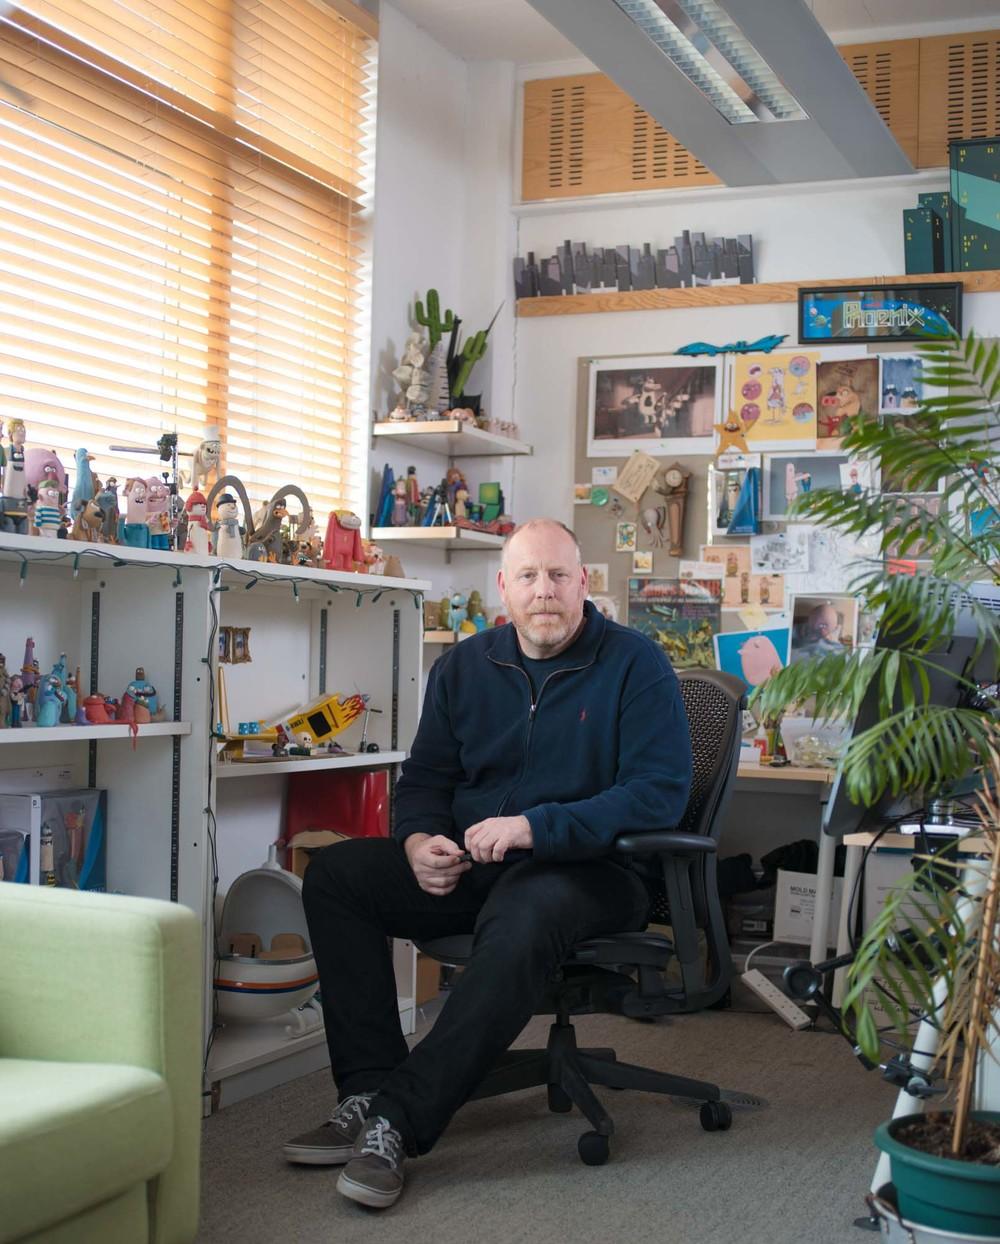 Aardman Animations Portrait